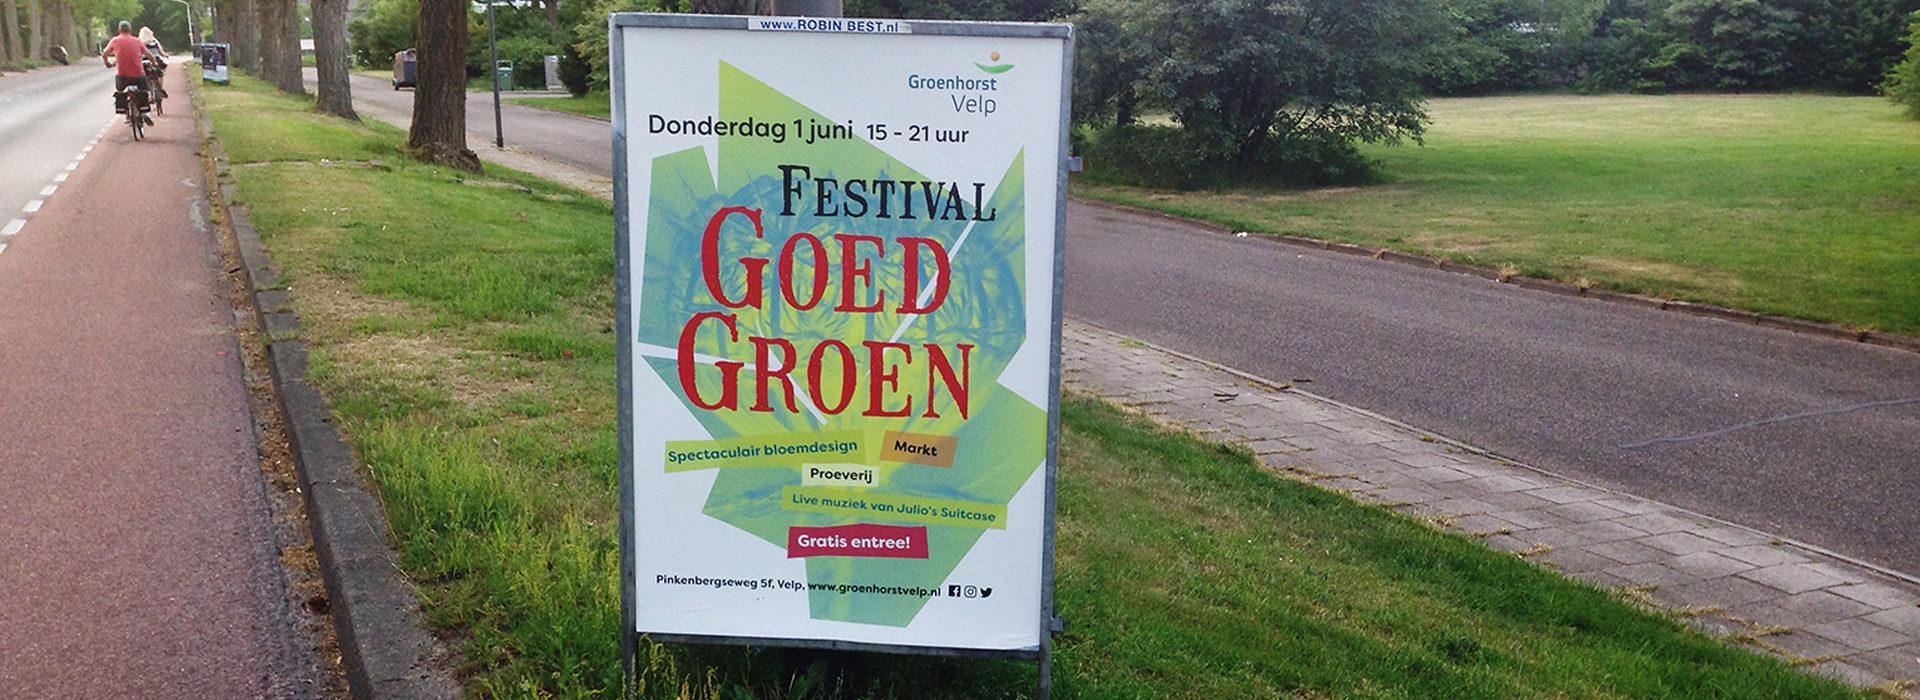 Groenhorst, festivalaffiche